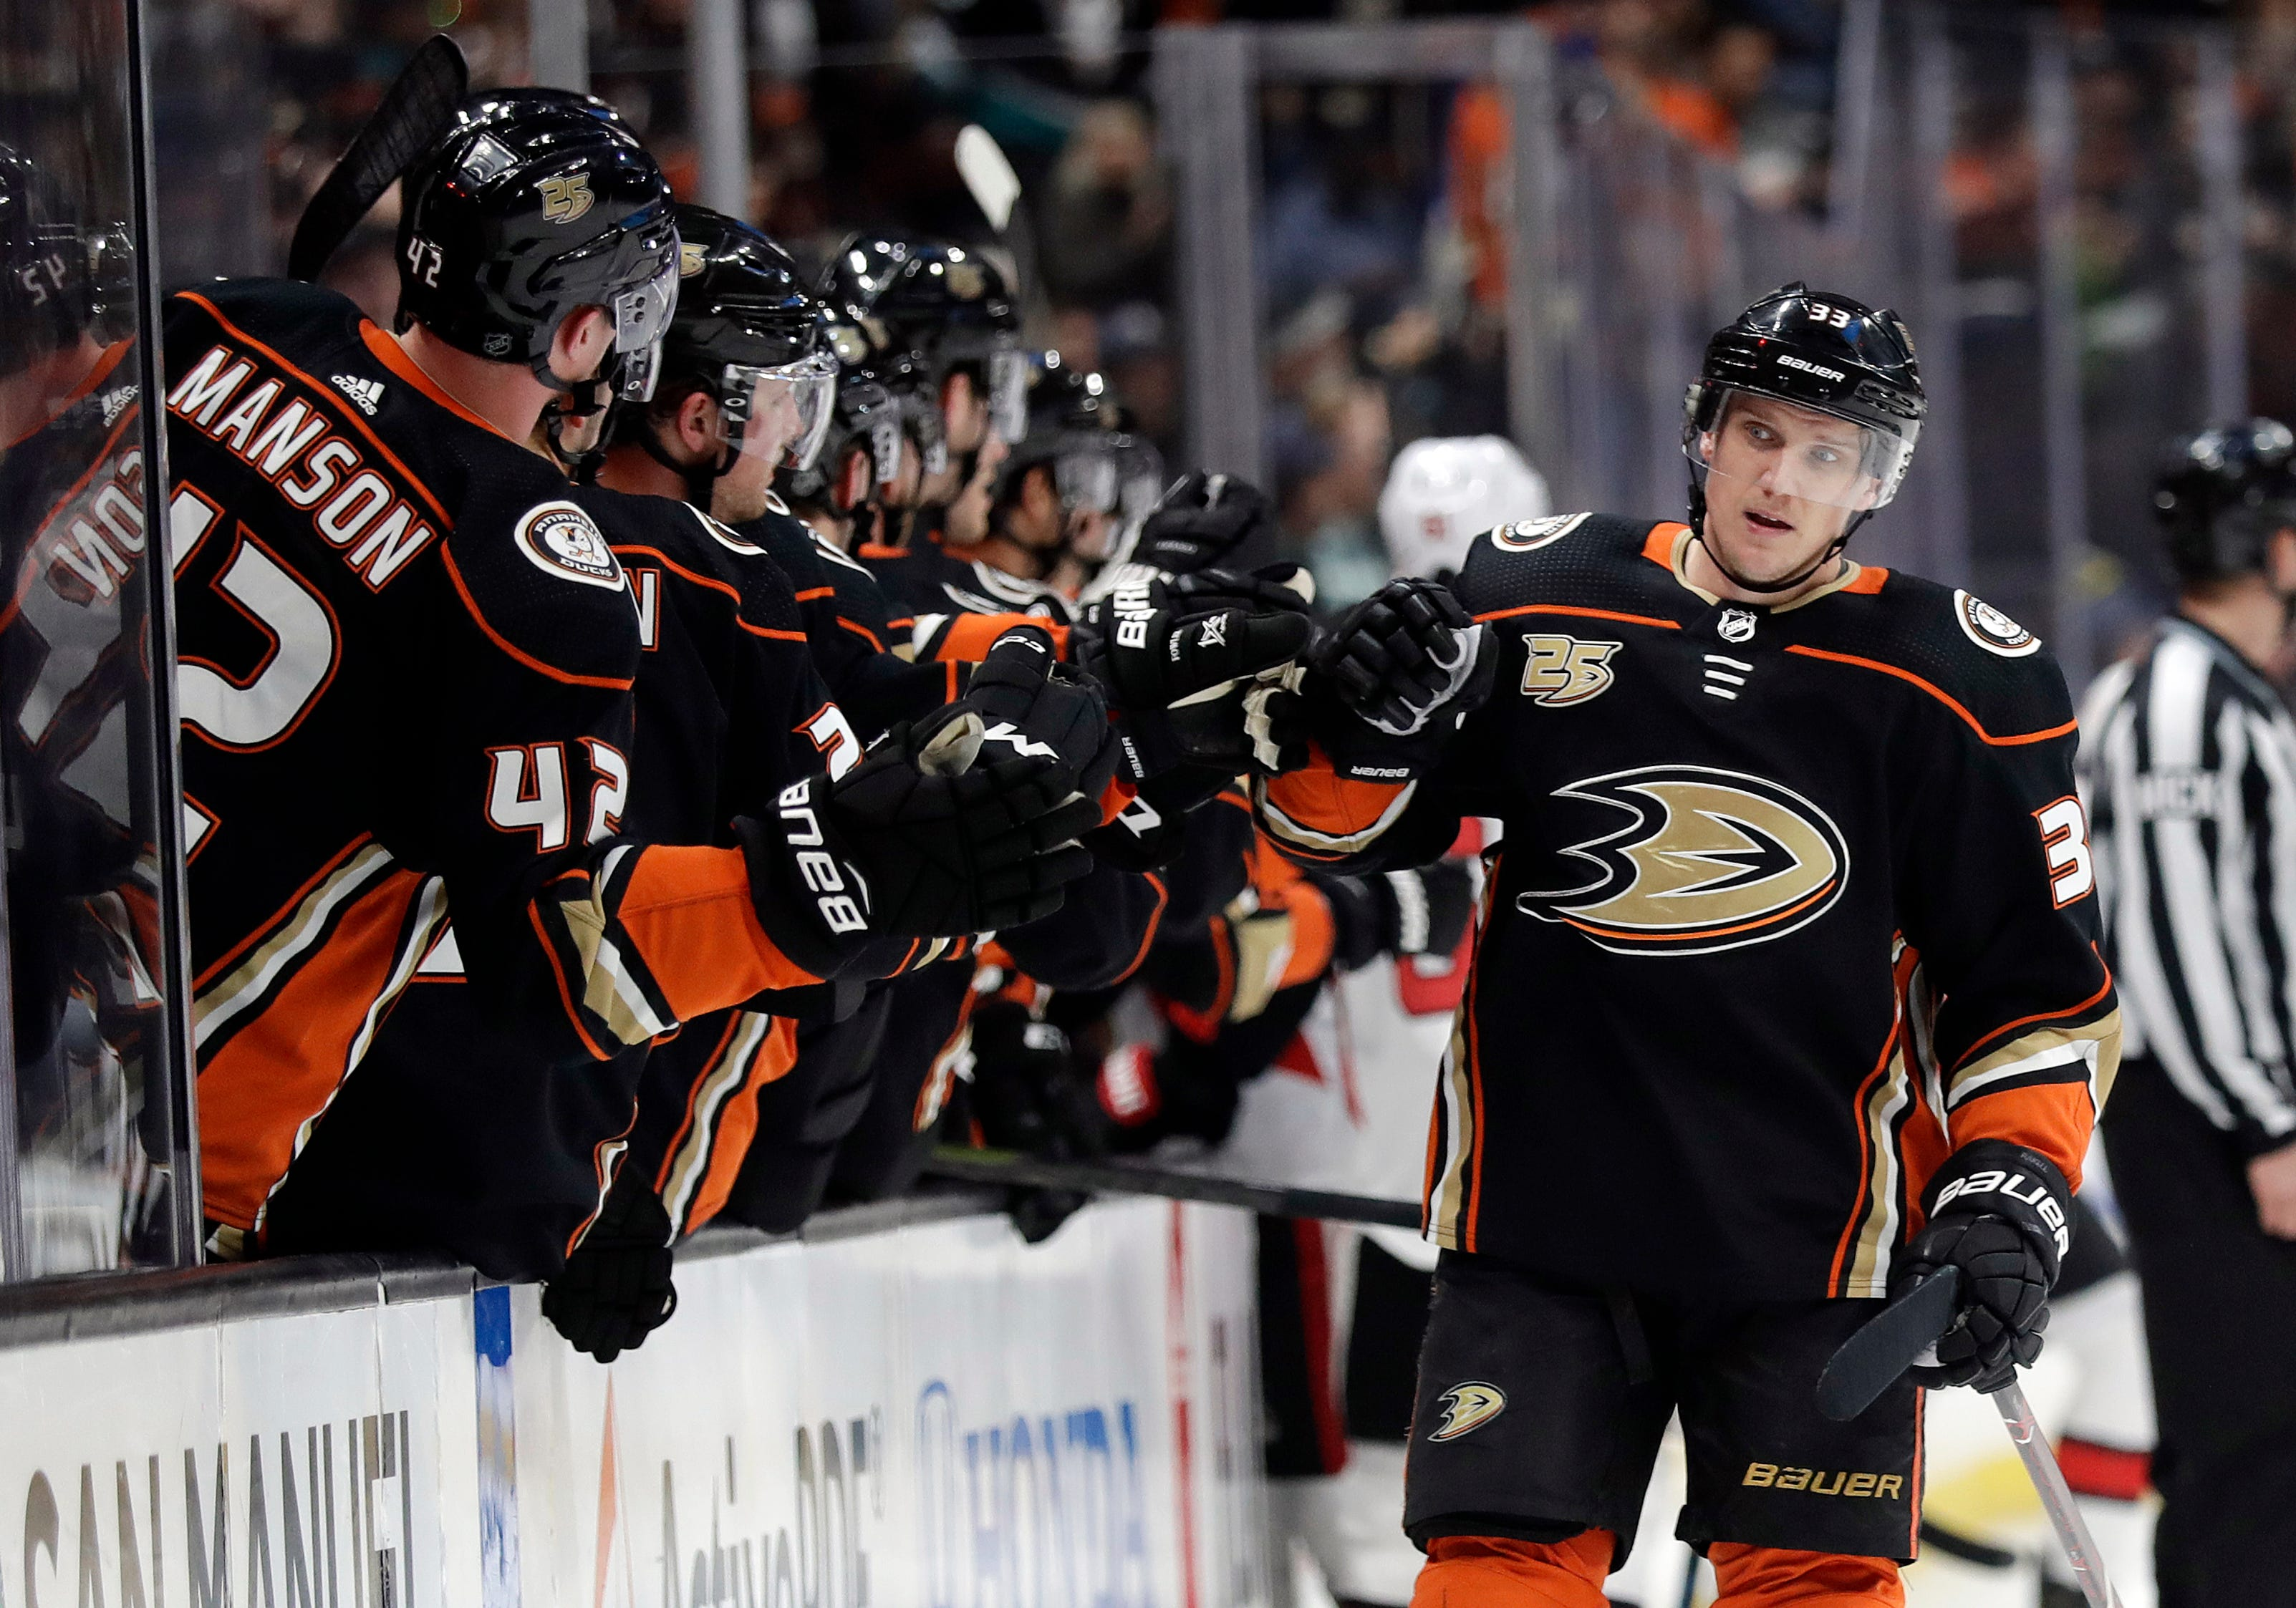 Senators snap 8-game skid with 2-1 win over Ducks in OT